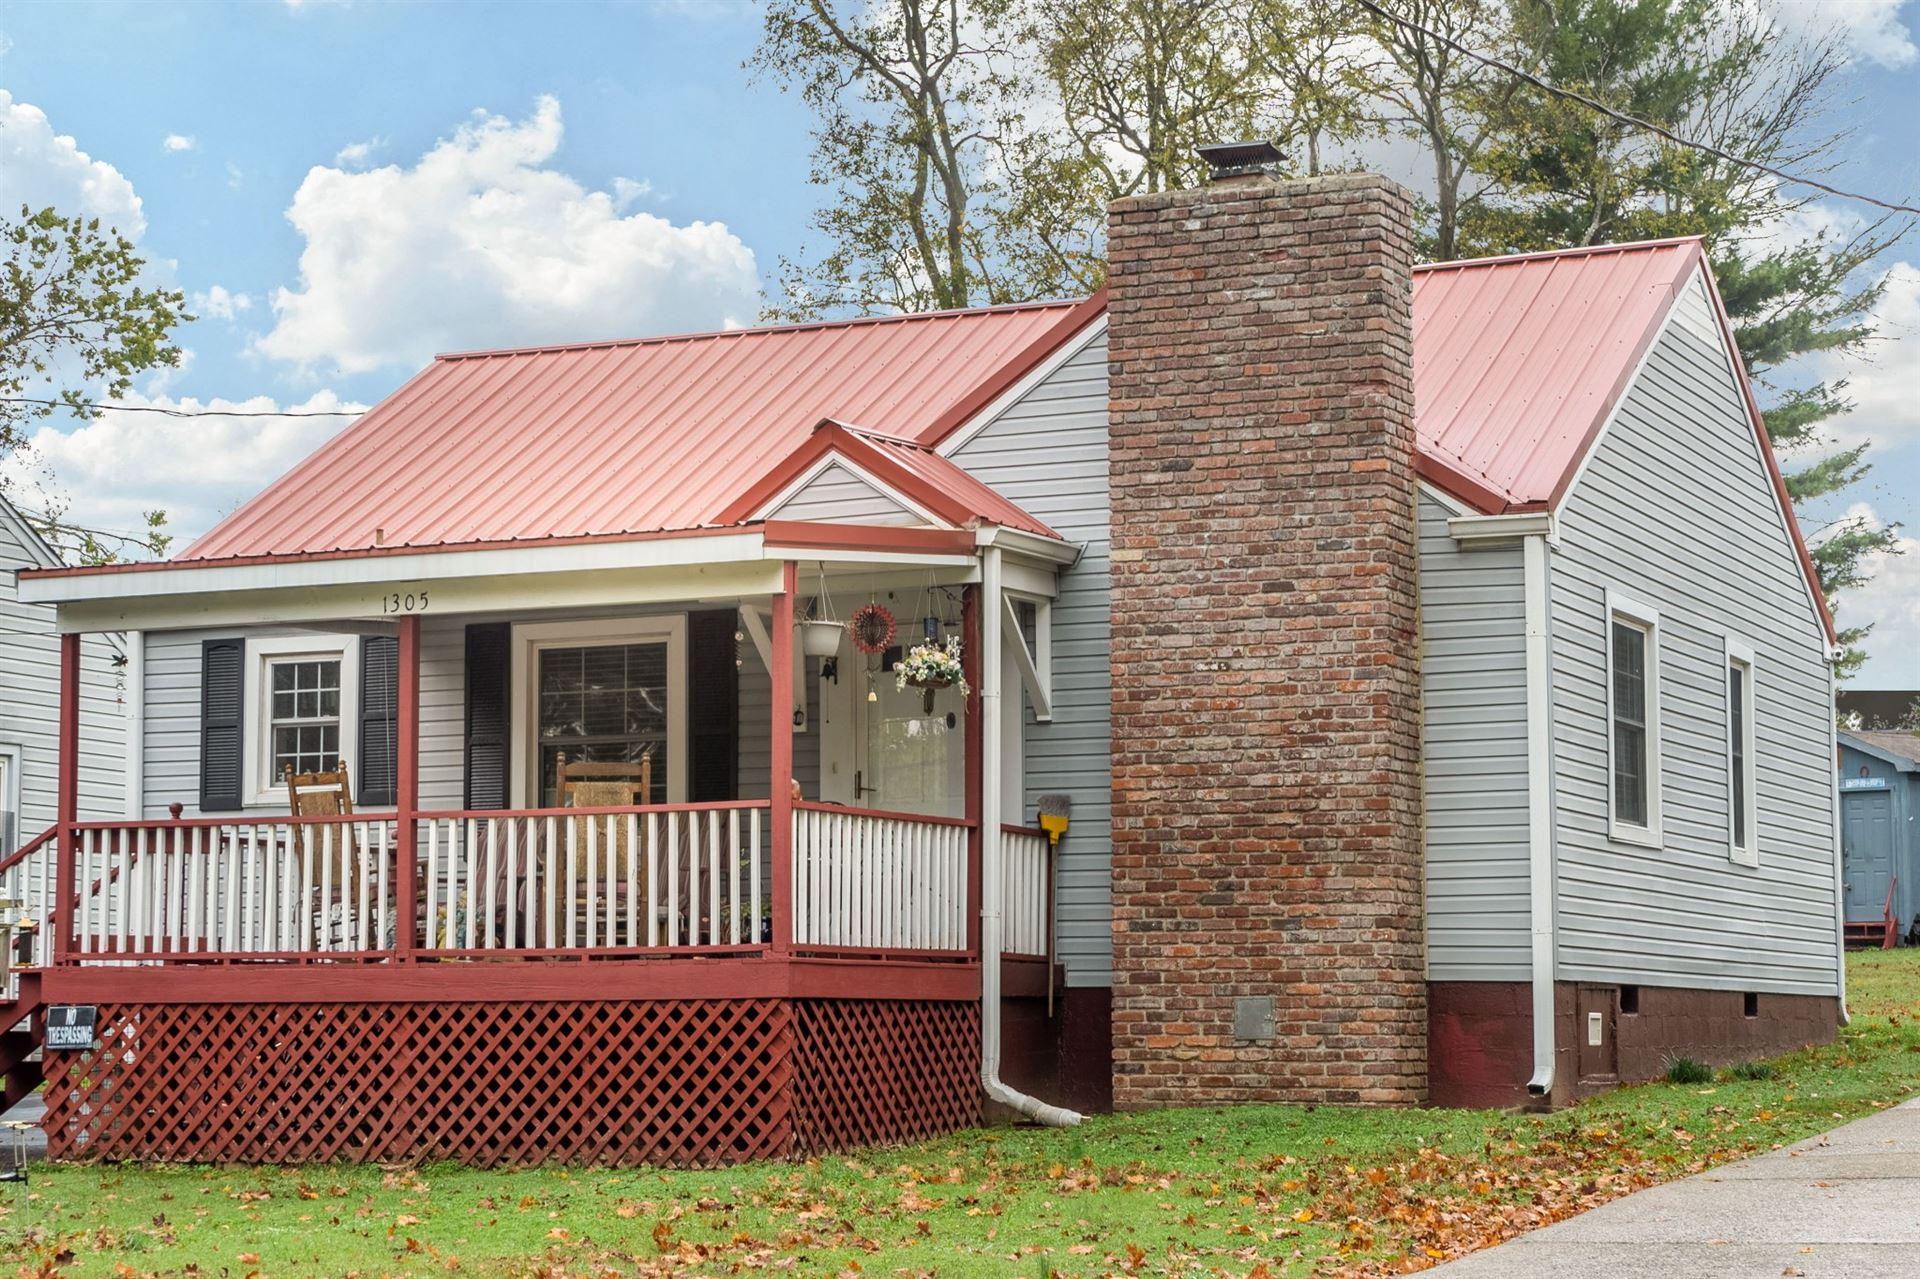 1305 Cardinal Ave, Nashville, TN 37216 - MLS#: 2201739